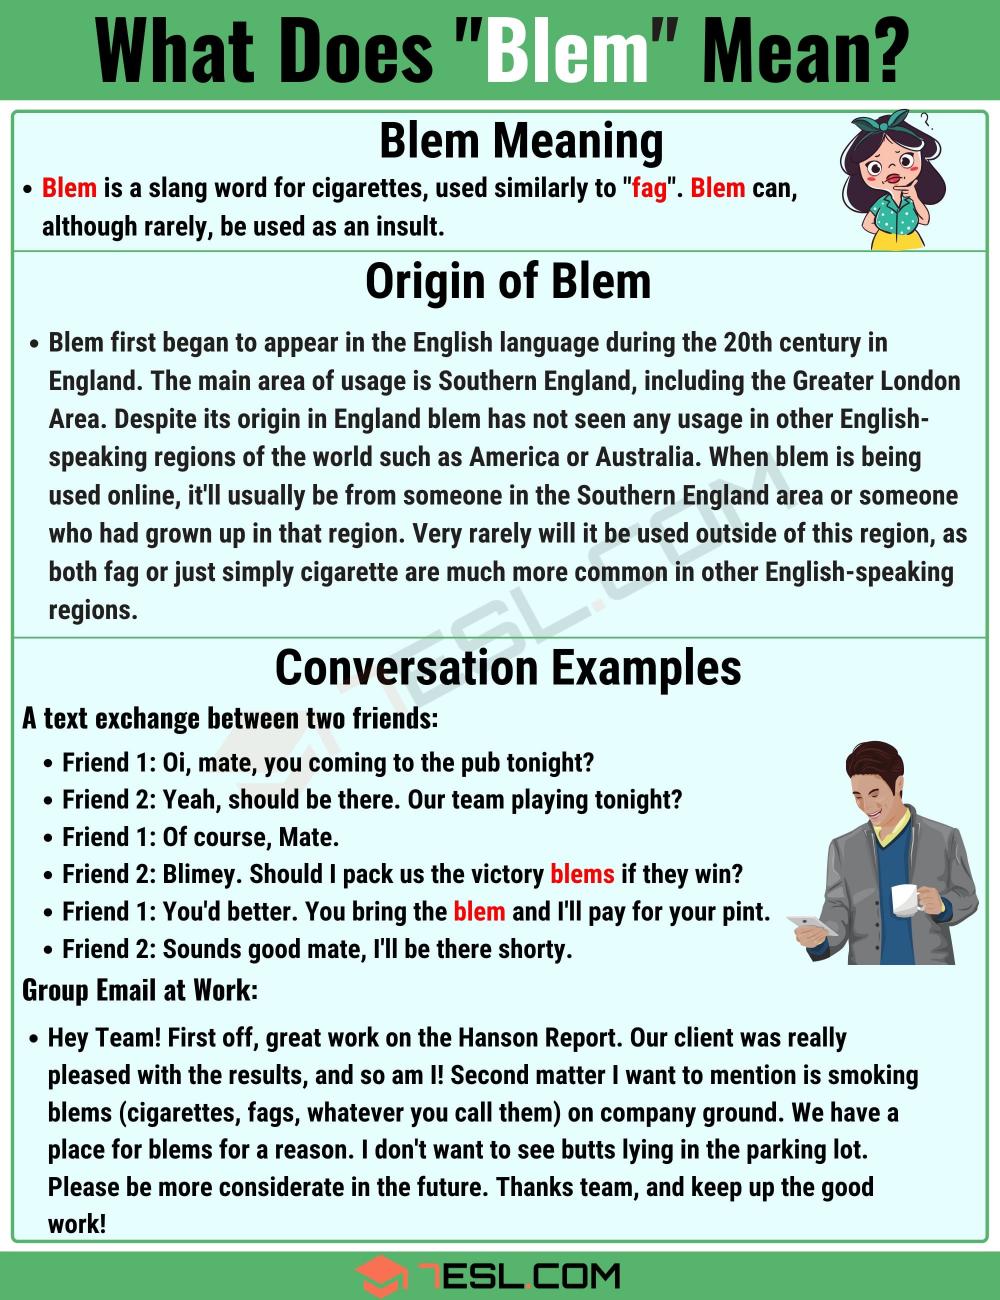 Blem Meaning What Does The Term Blem Mean In Texting And Online Slang 7esl Slang Words British Slang Words Sms Language